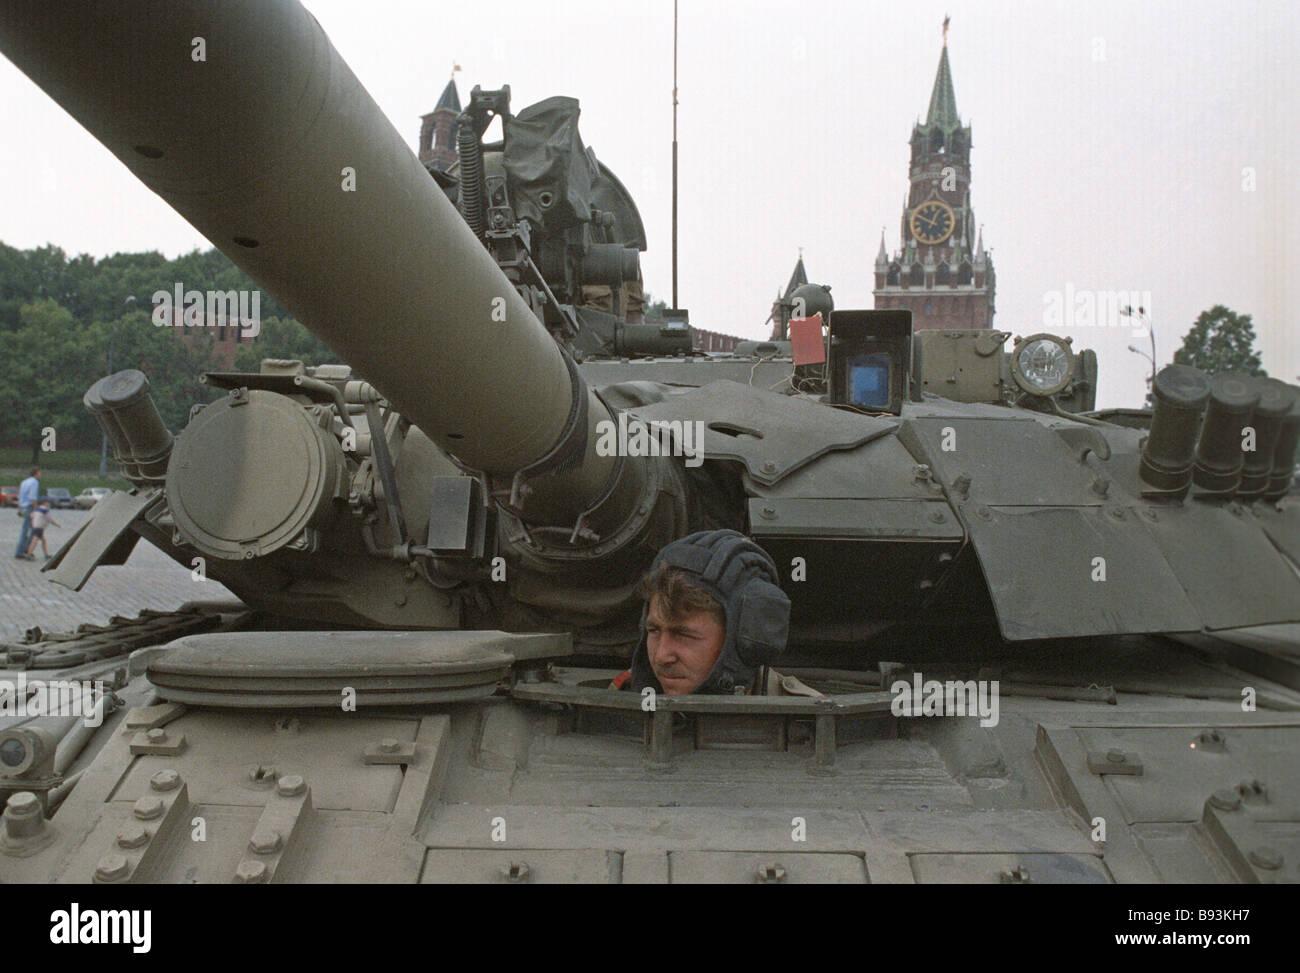 http://c7.alamy.com/comp/B93KH7/a-tank-on-vasilyevsky-spusk-near-the-kremlin-during-the-gkchp-putsch-B93KH7.jpg